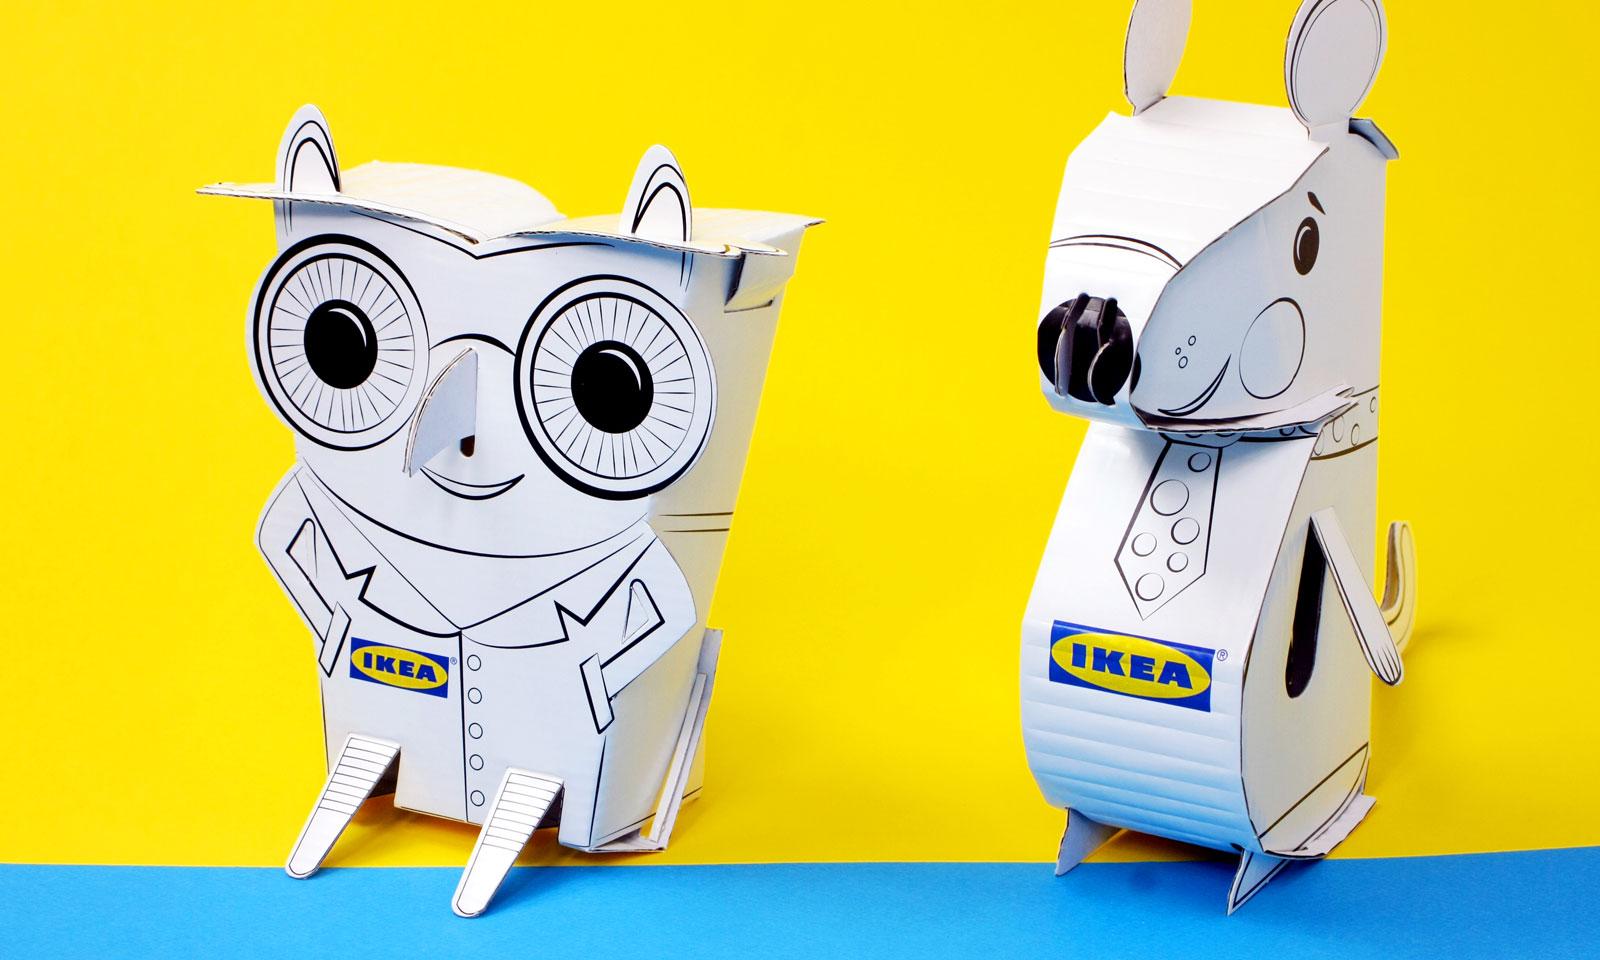 Modele 3D dla IKEA